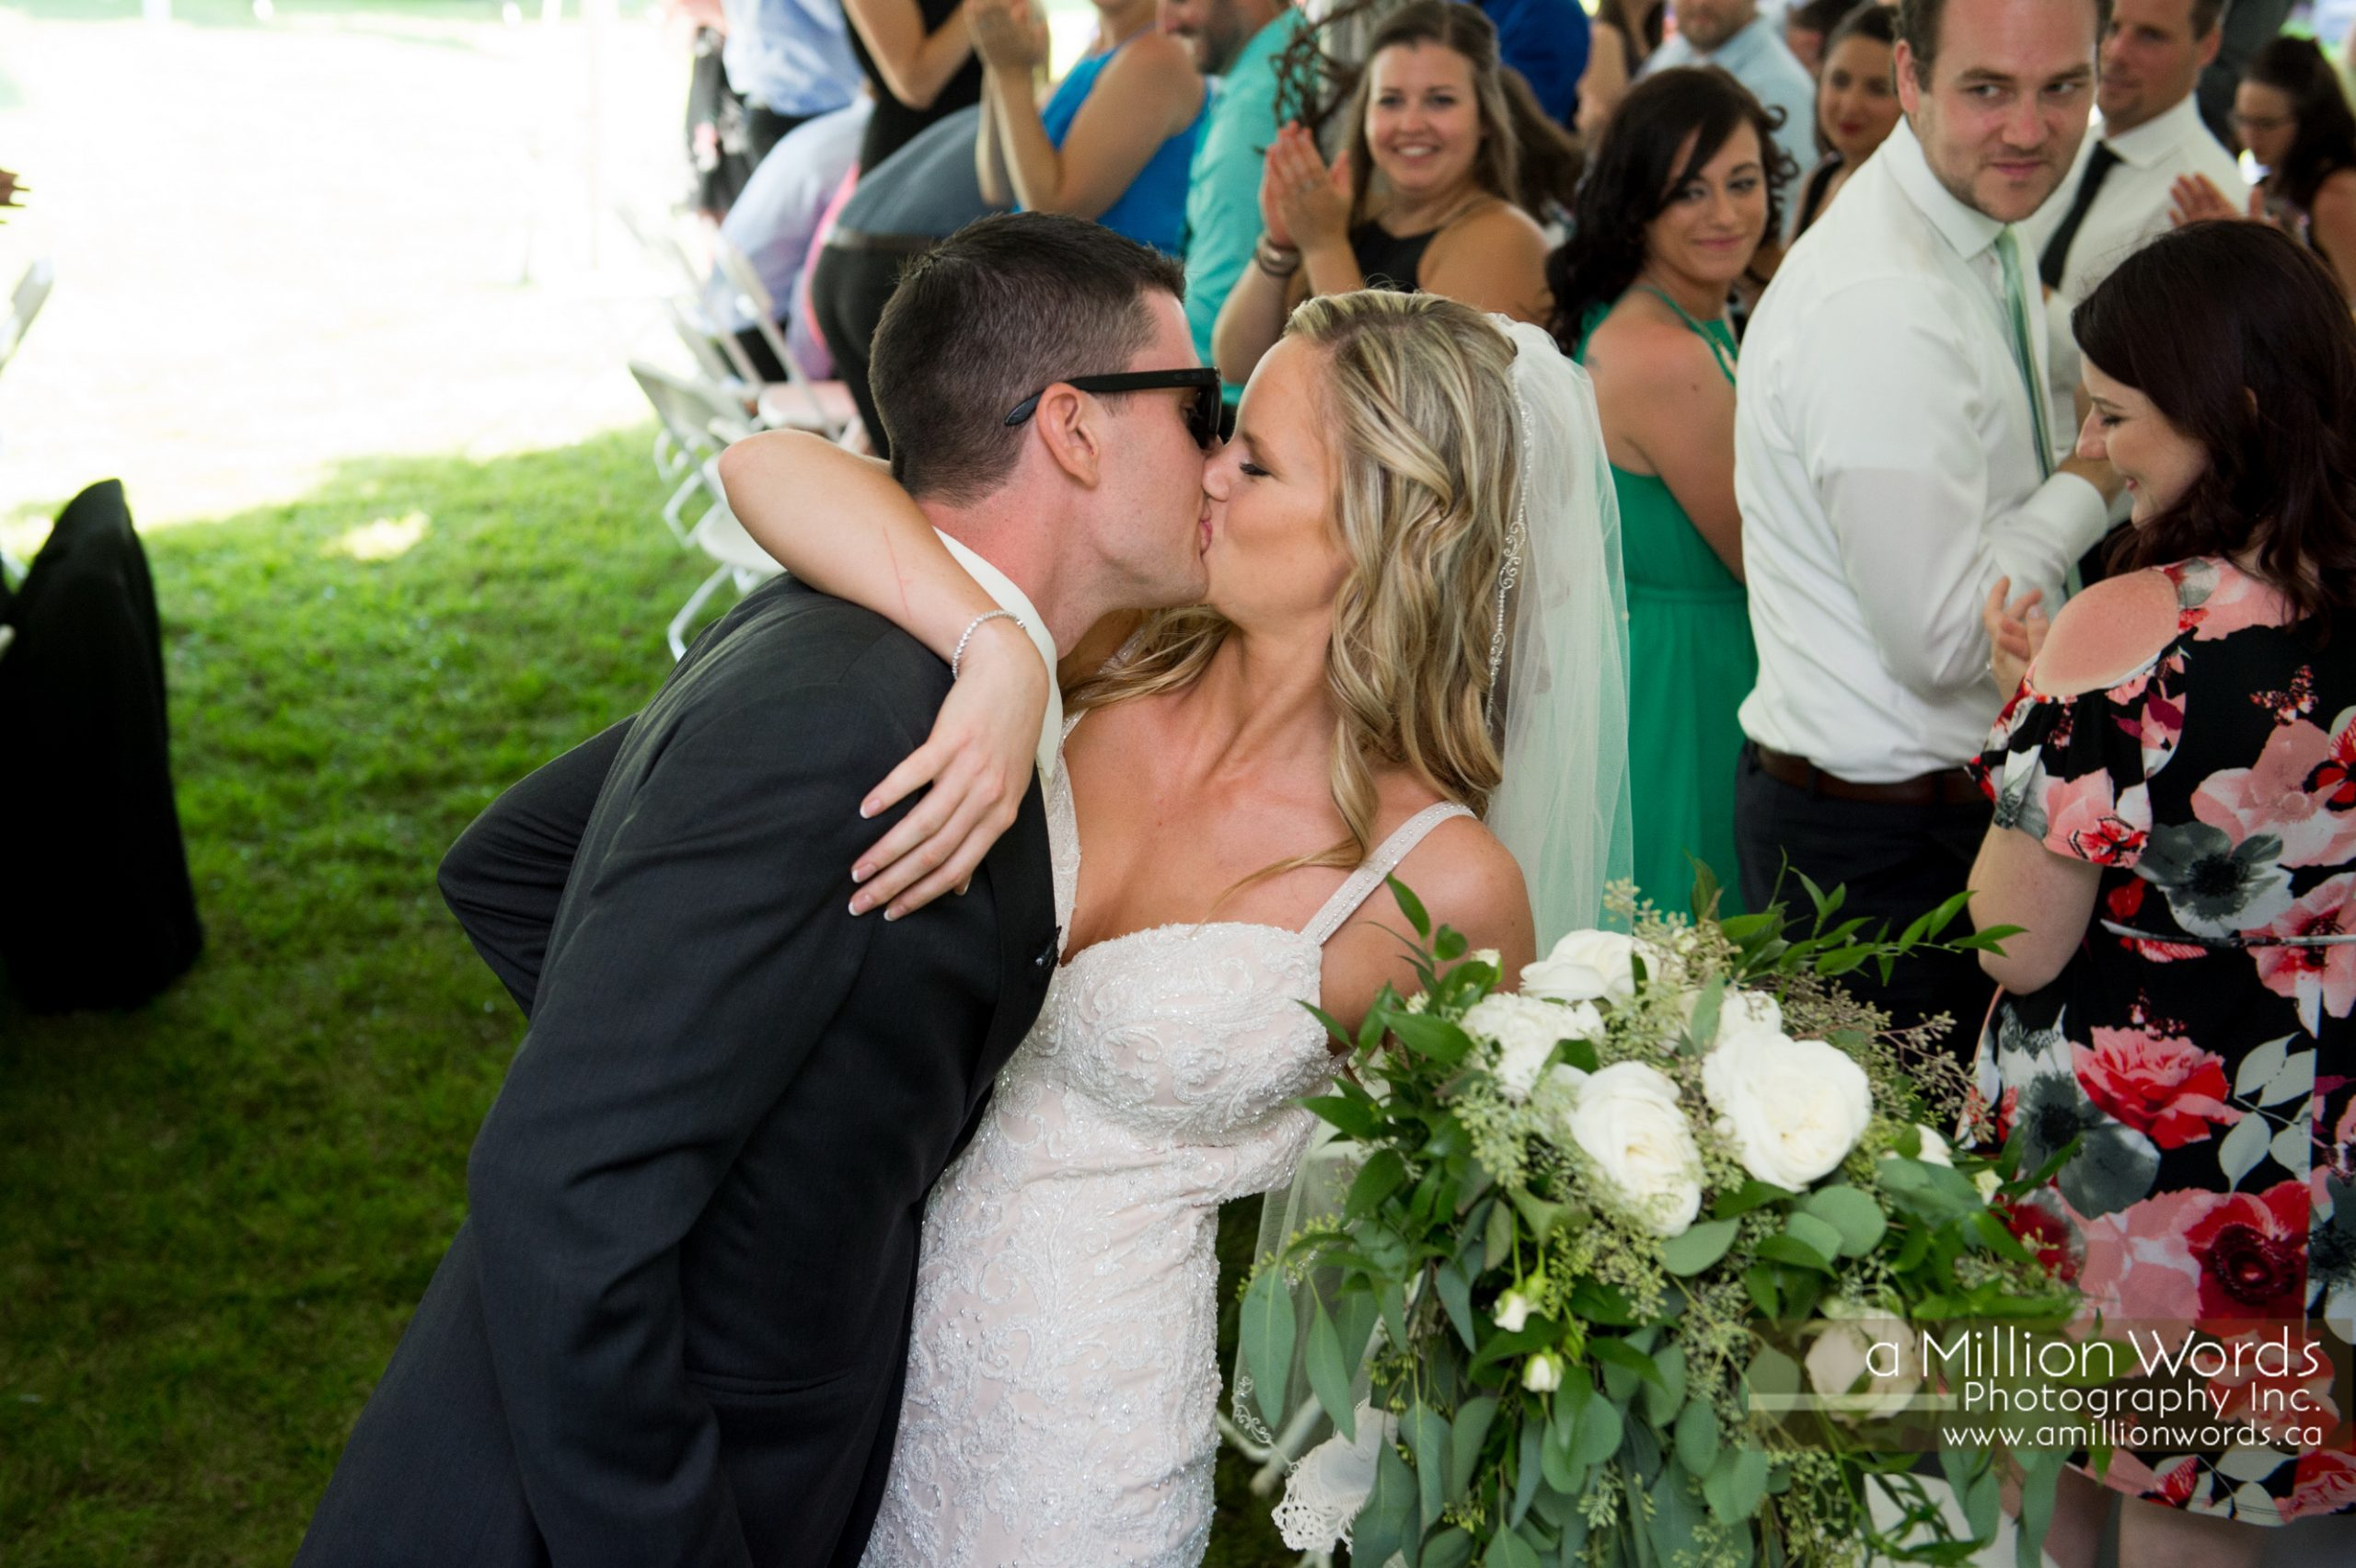 arthur_wedding_photographer57